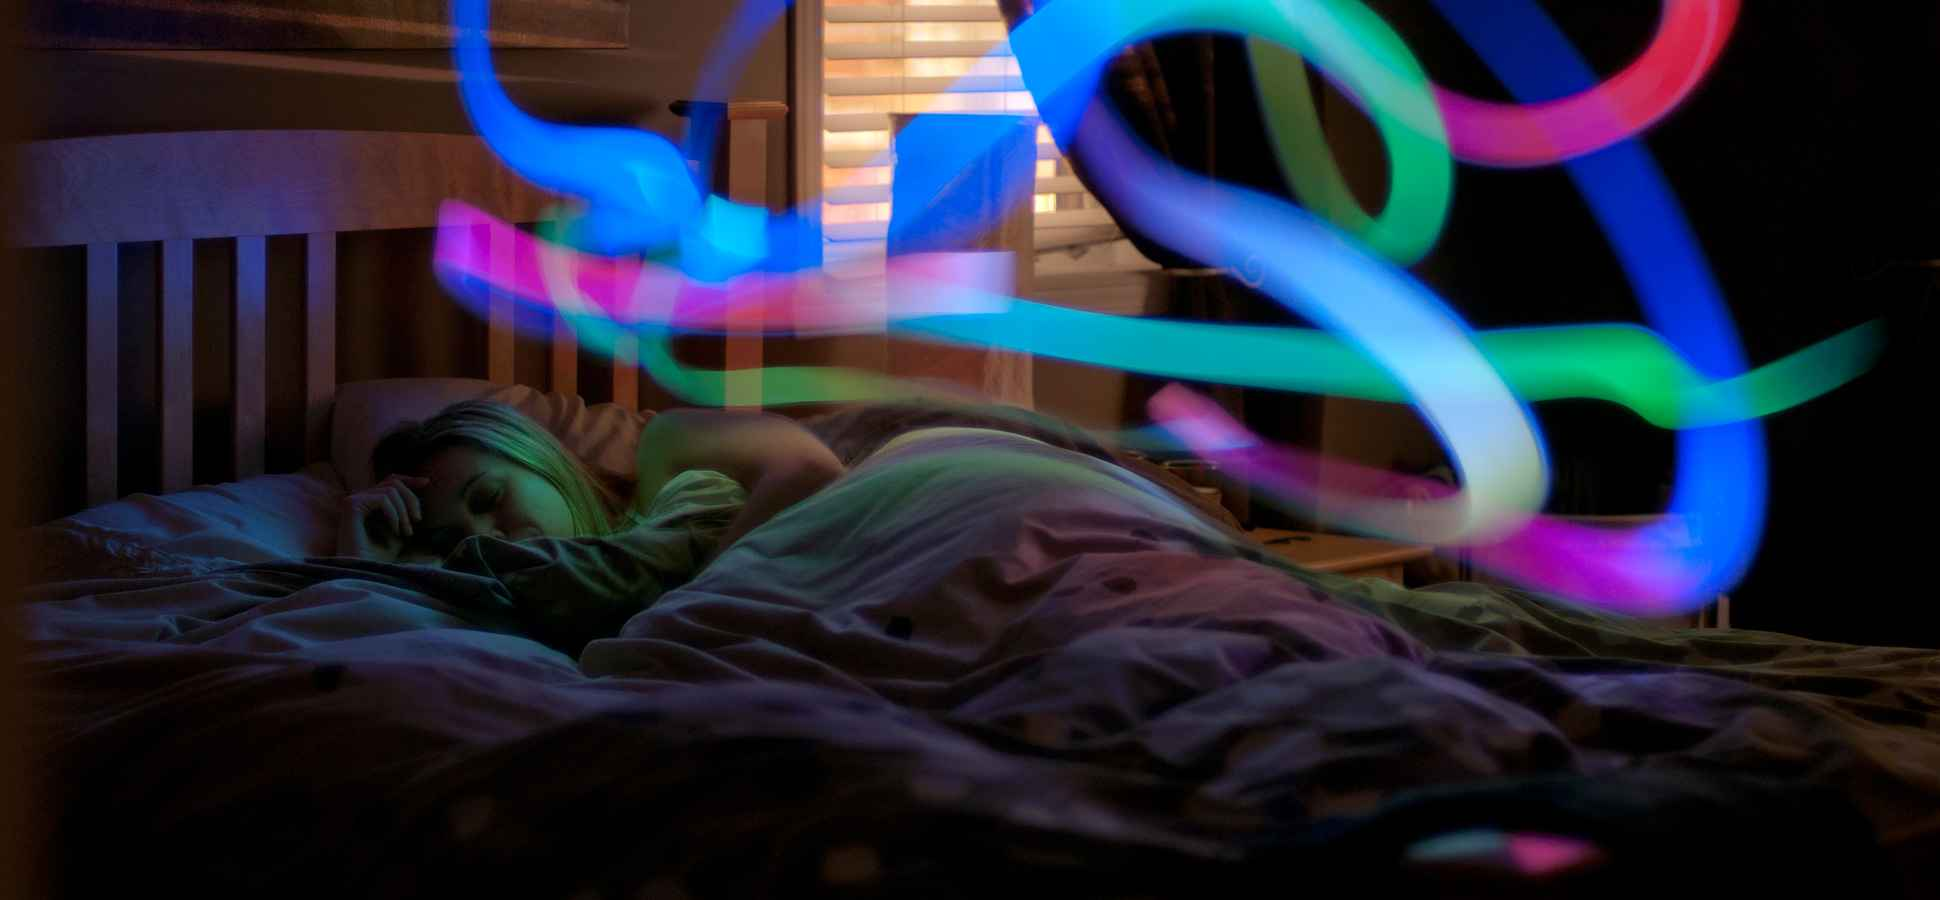 How to Be More Creative: More Sleep, Less Coffee